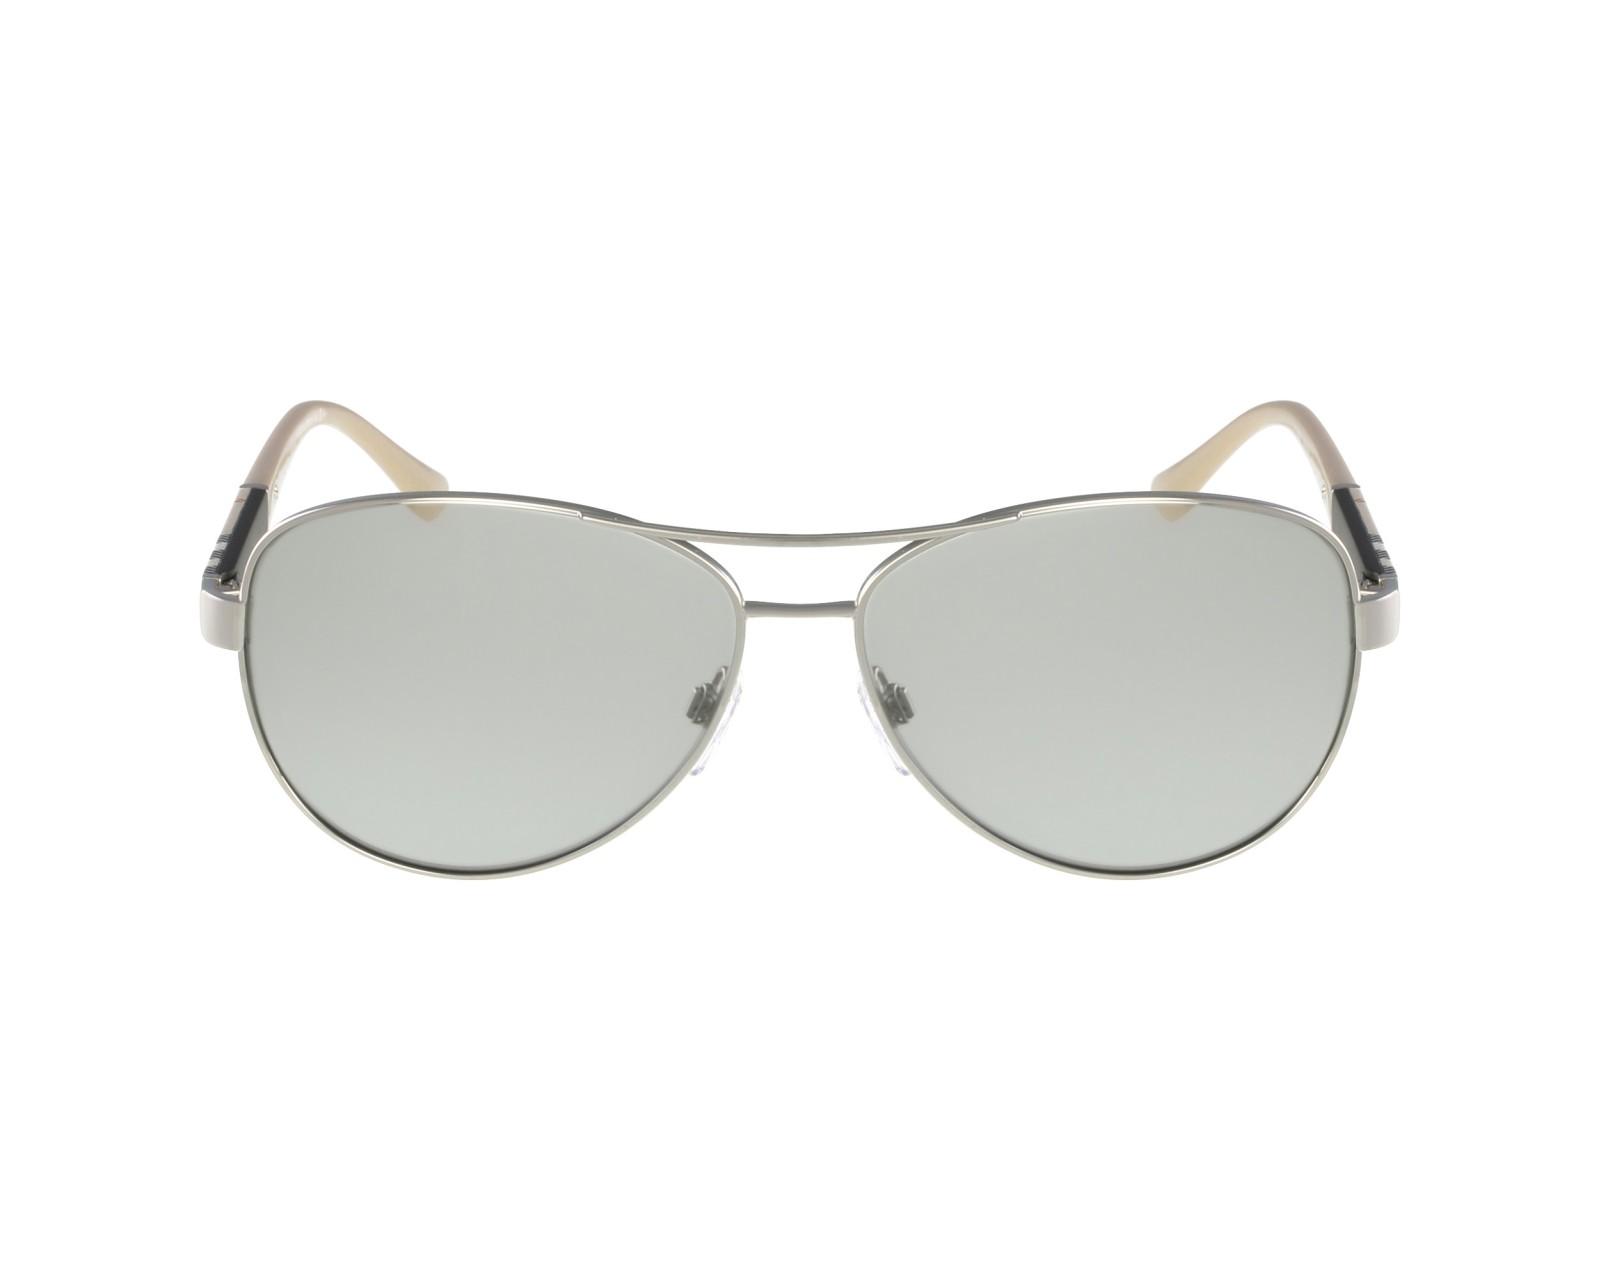 f14976c4c01 Sunglasses Burberry BE-3080 1005 6V 59-14 Silver Beige profile view